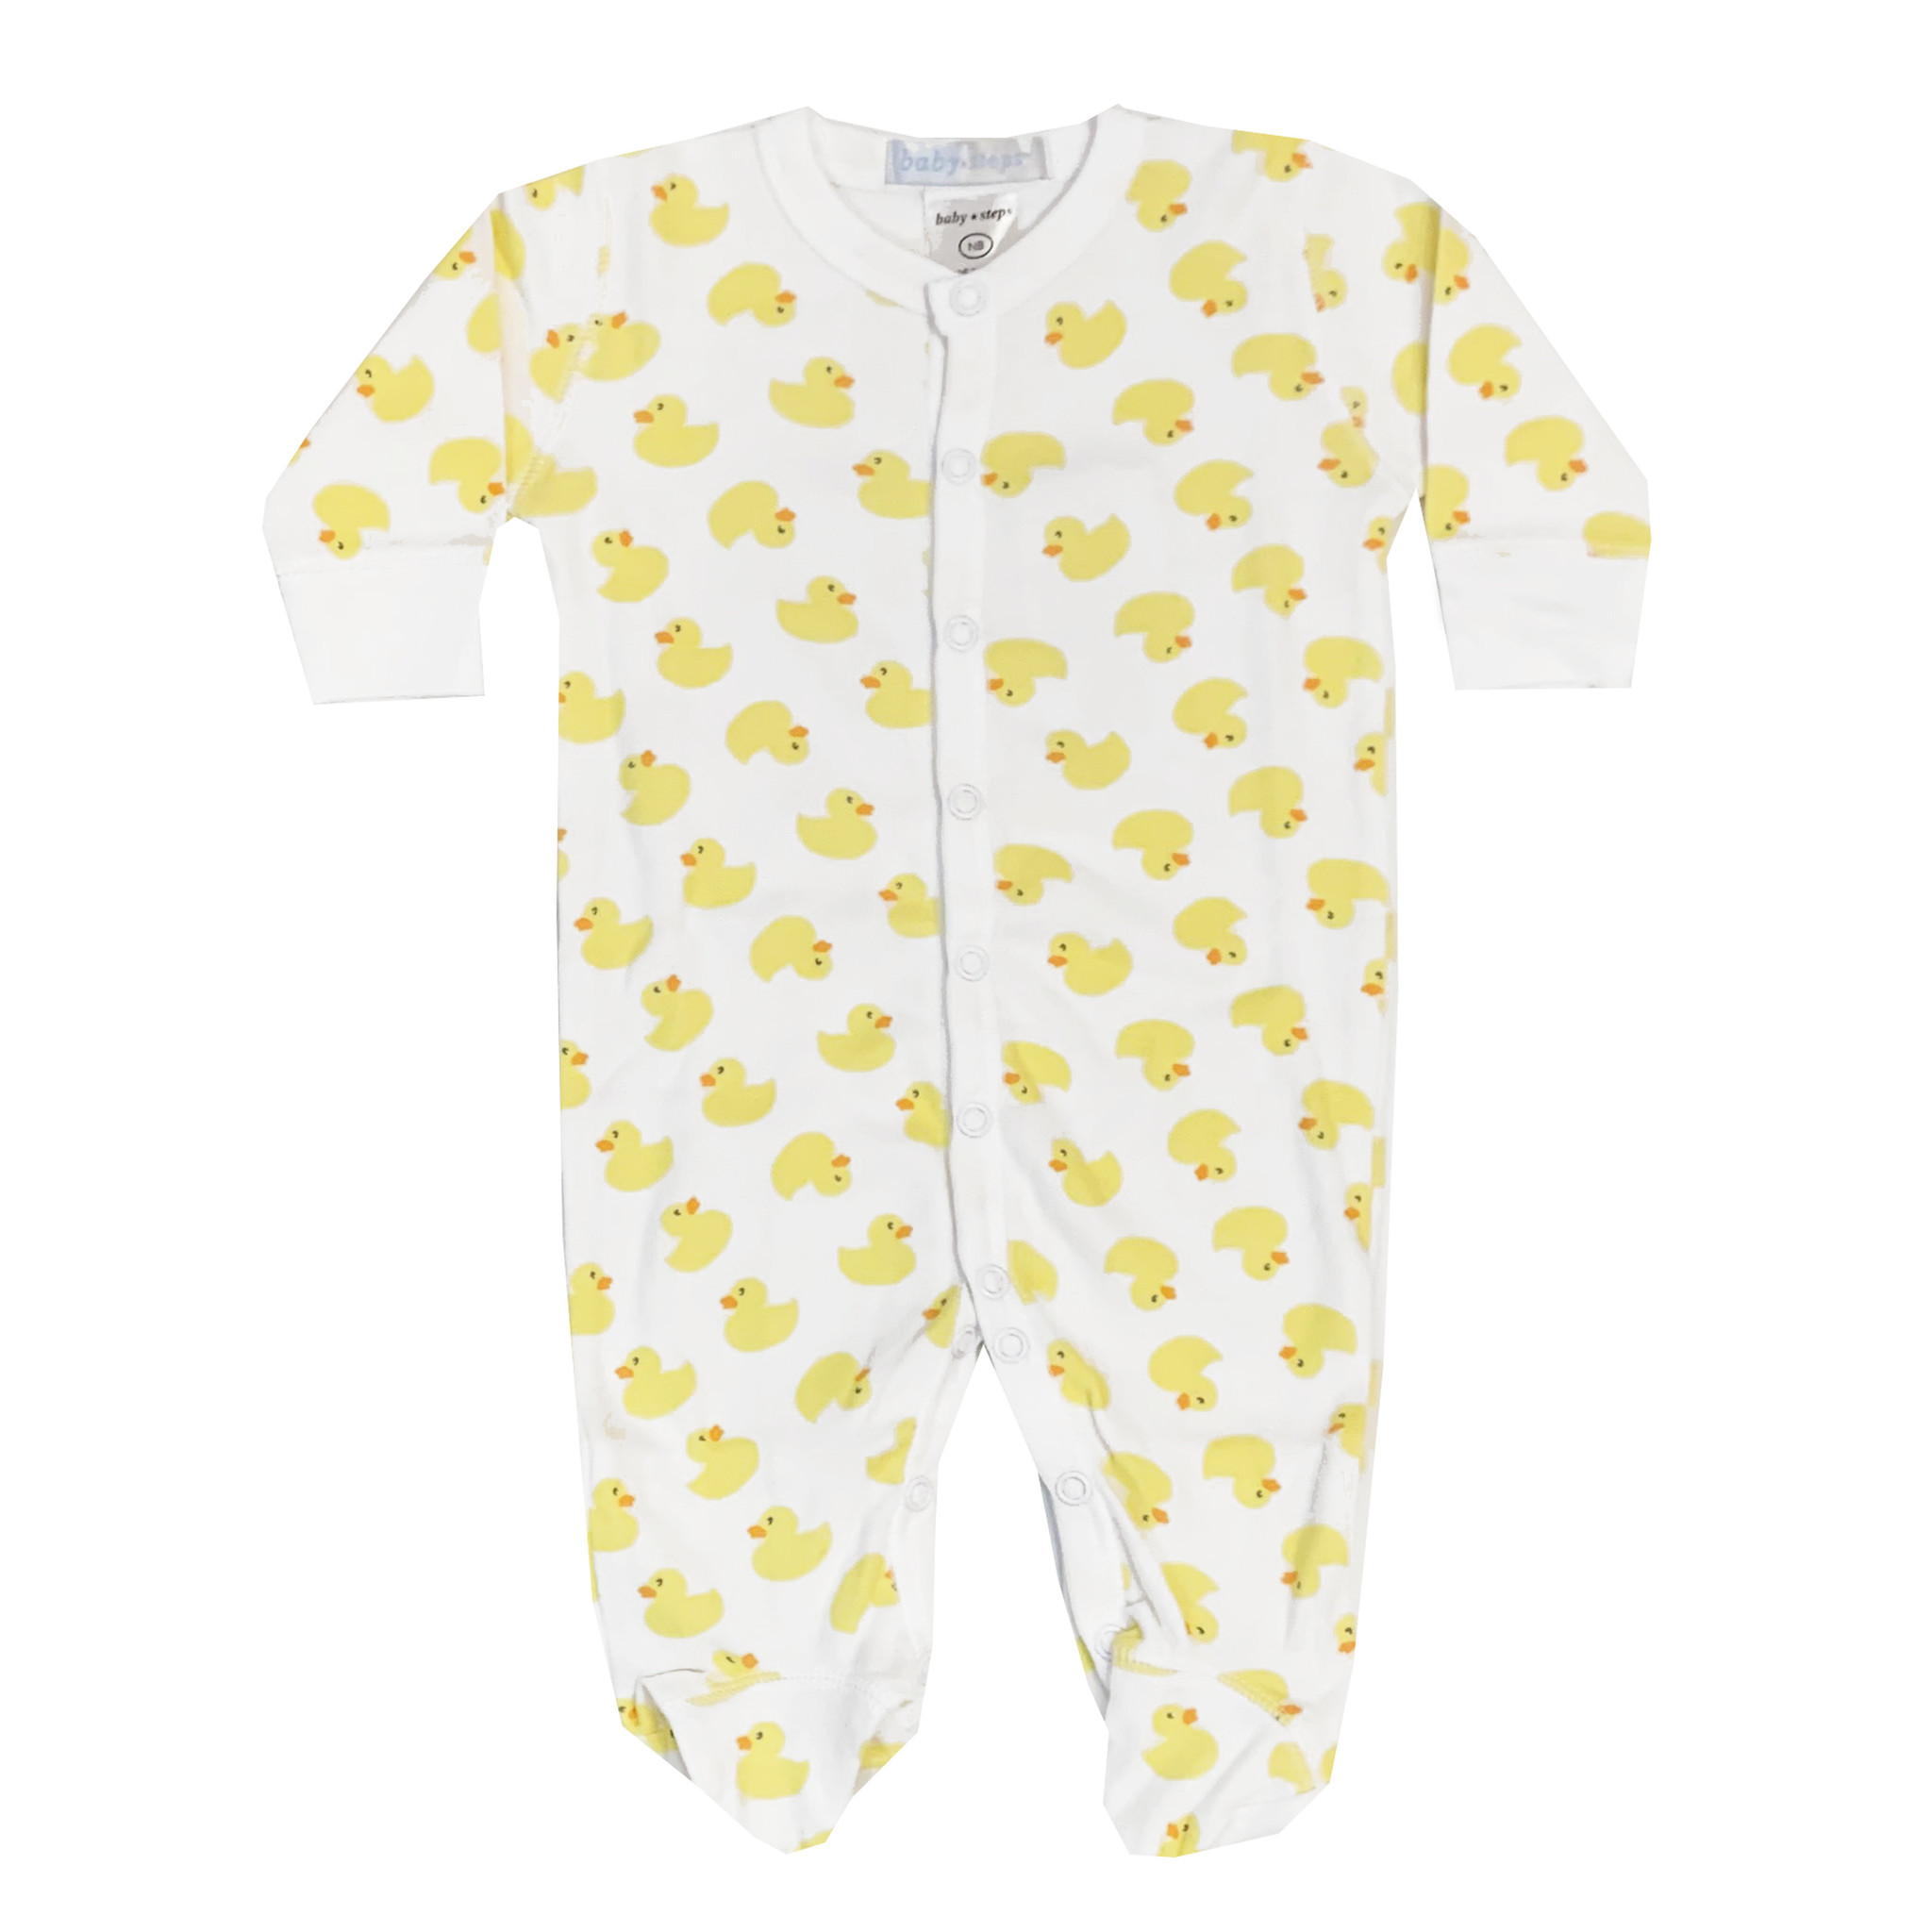 Baby Steps Yellow Ducks Footie